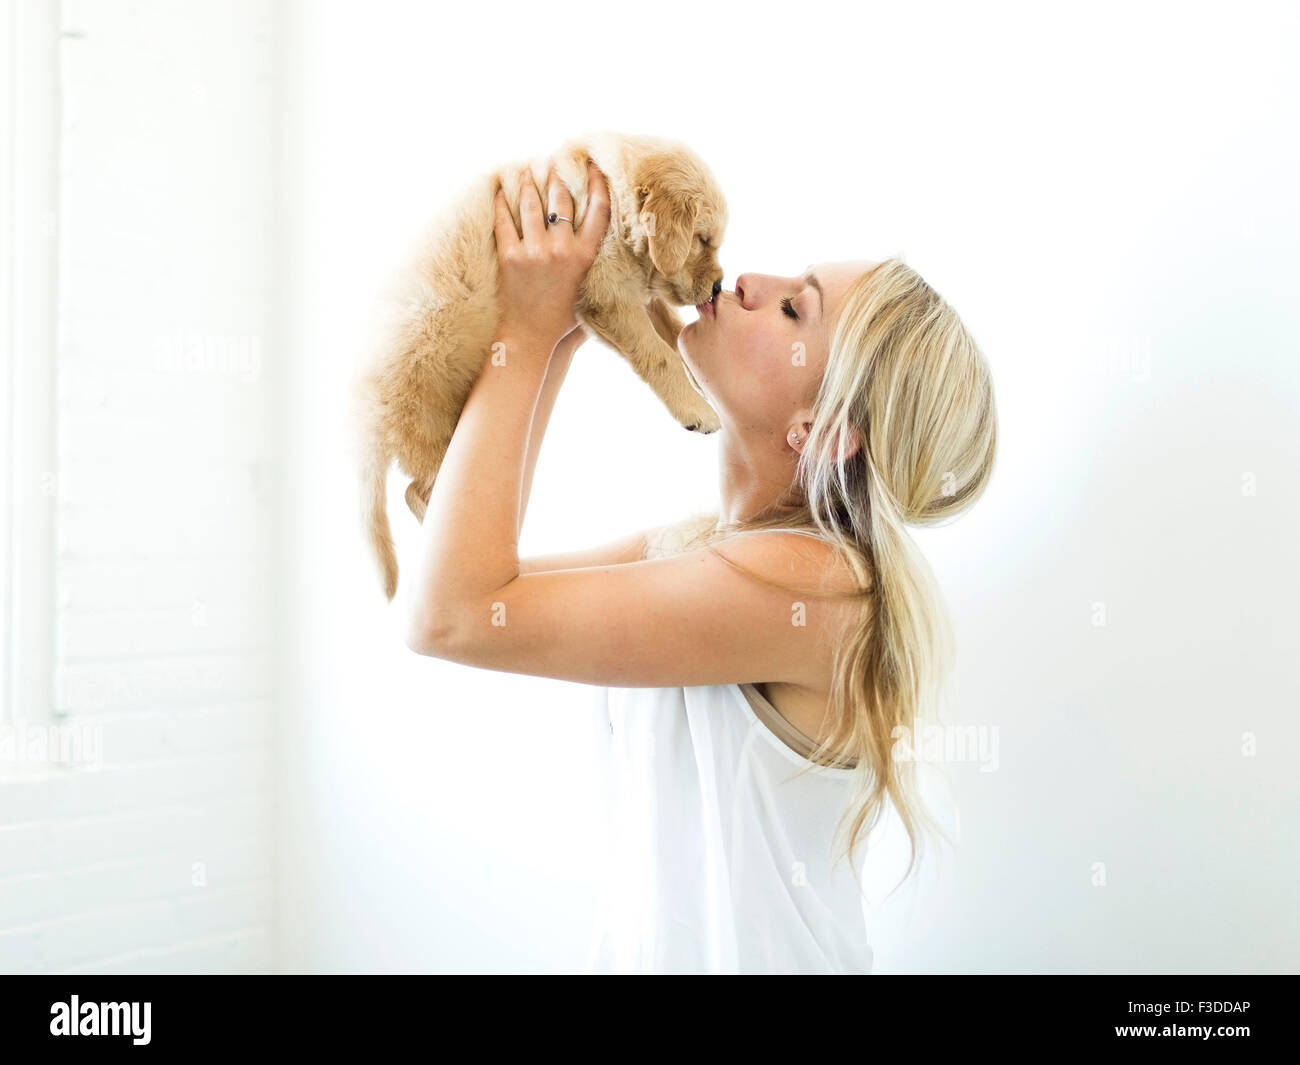 Studioaufnahme des Besitzers küssen Golden Retriever Welpen Stockbild